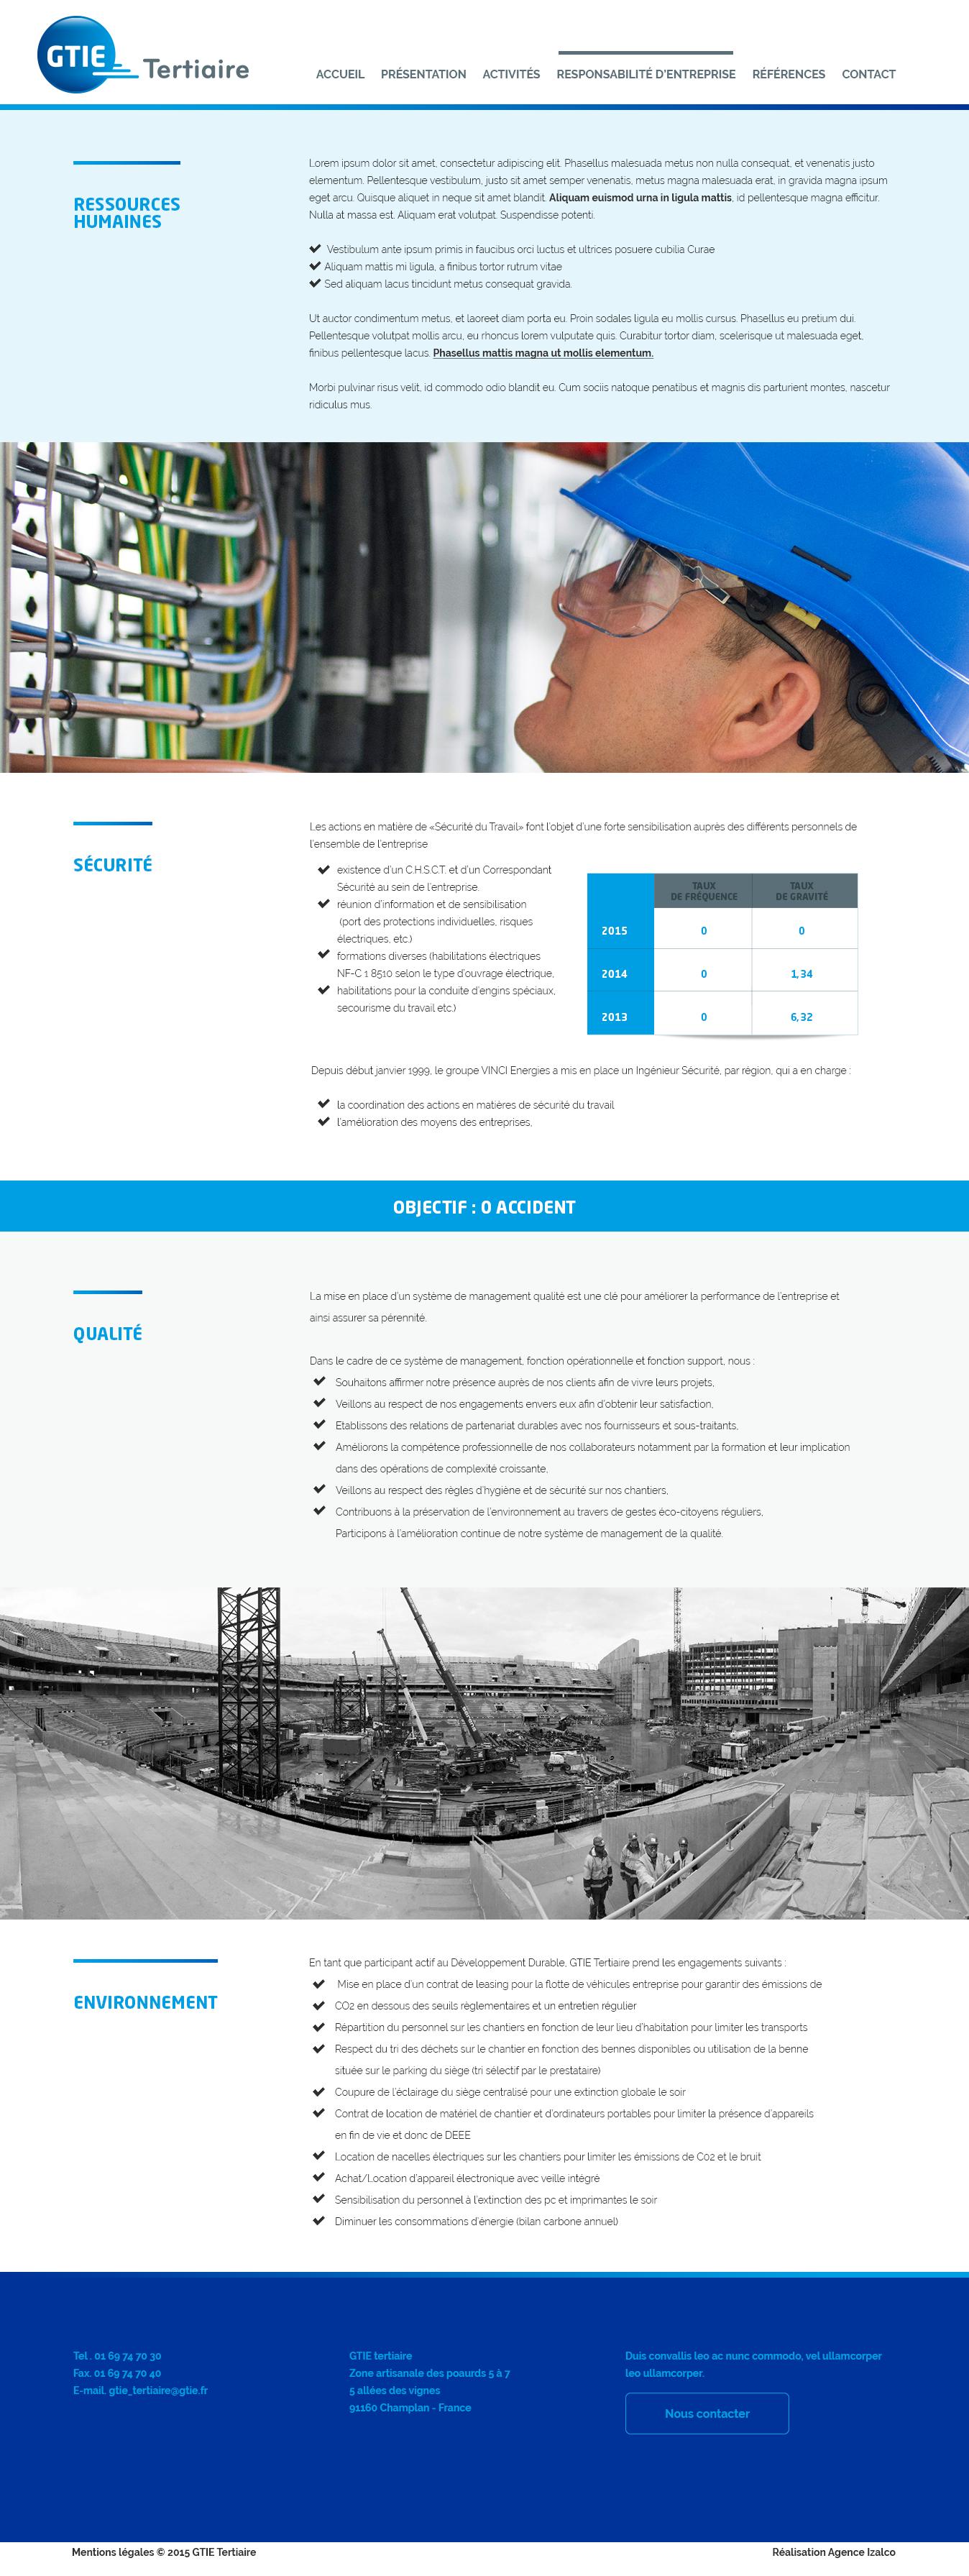 freelance-webdesigner-gtie-1